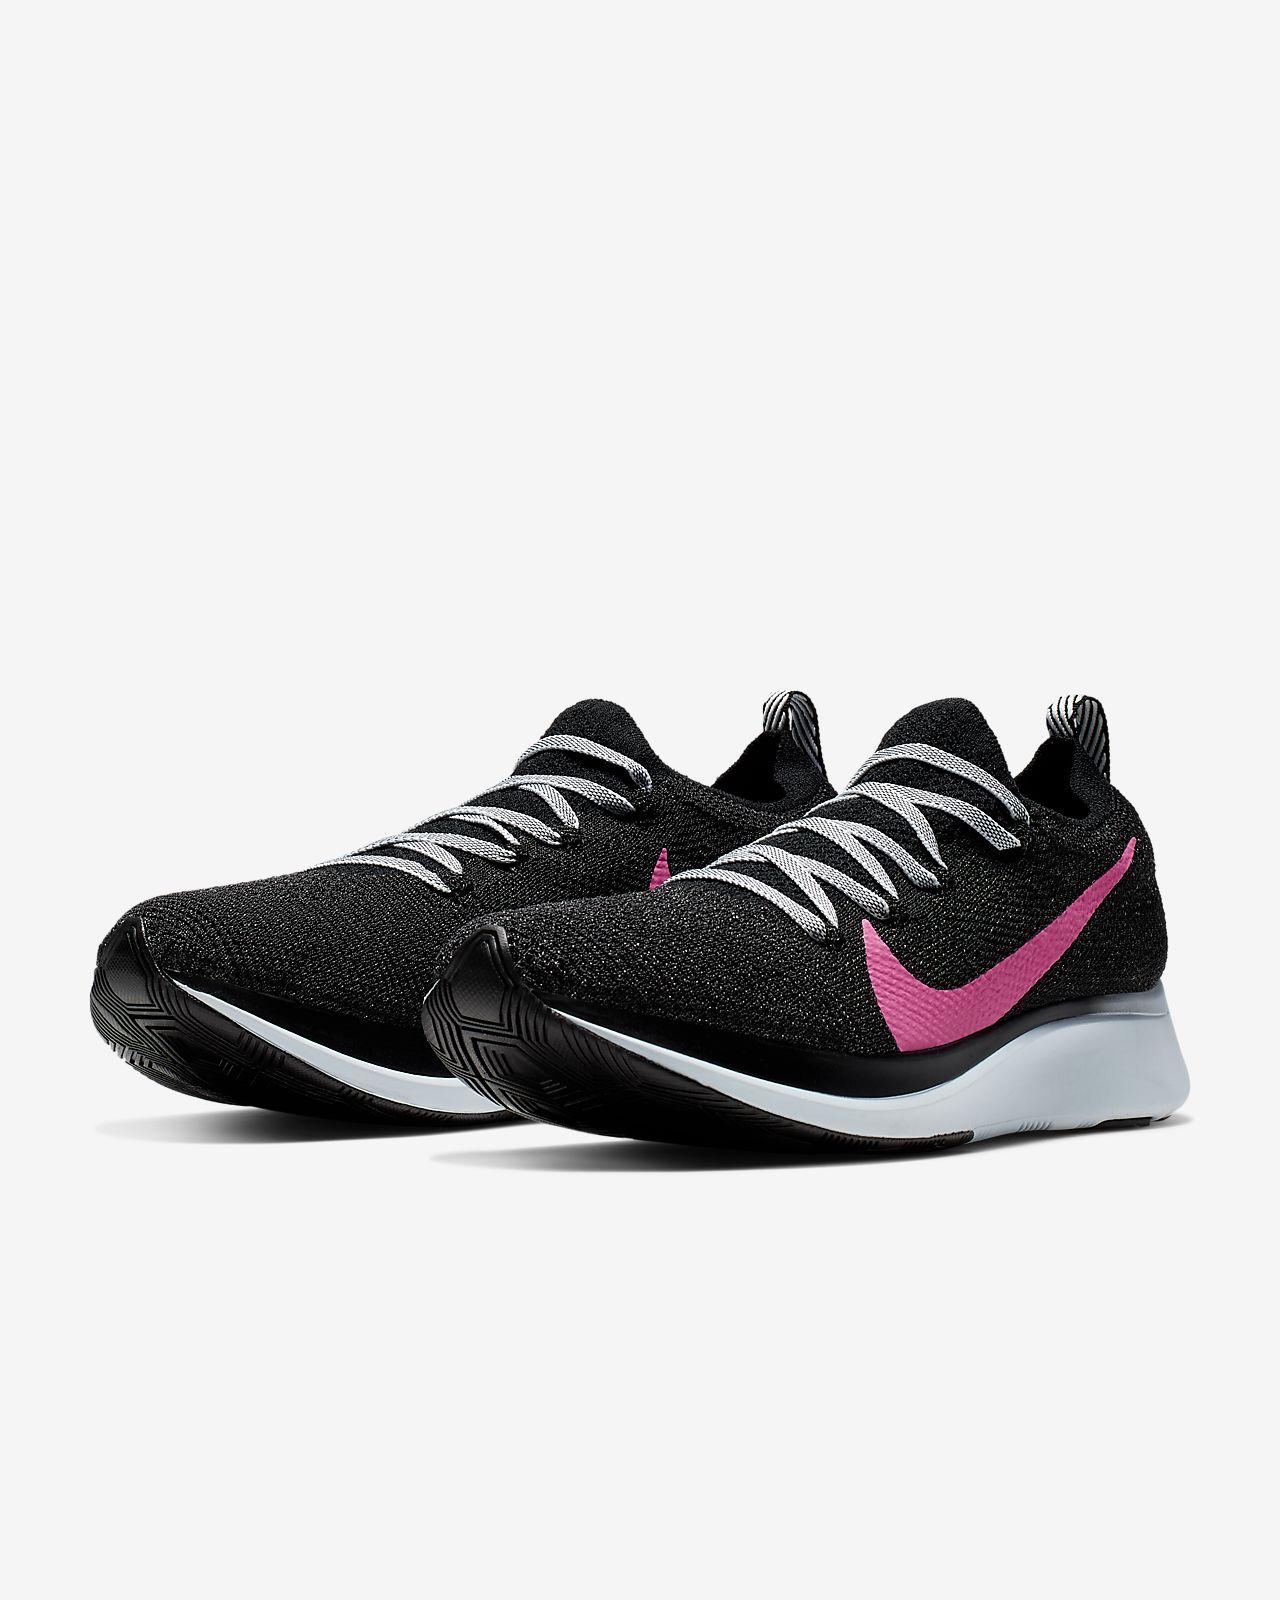 Flyknit Laufschuh Nike Zoom Fly Damen CxodBWQer